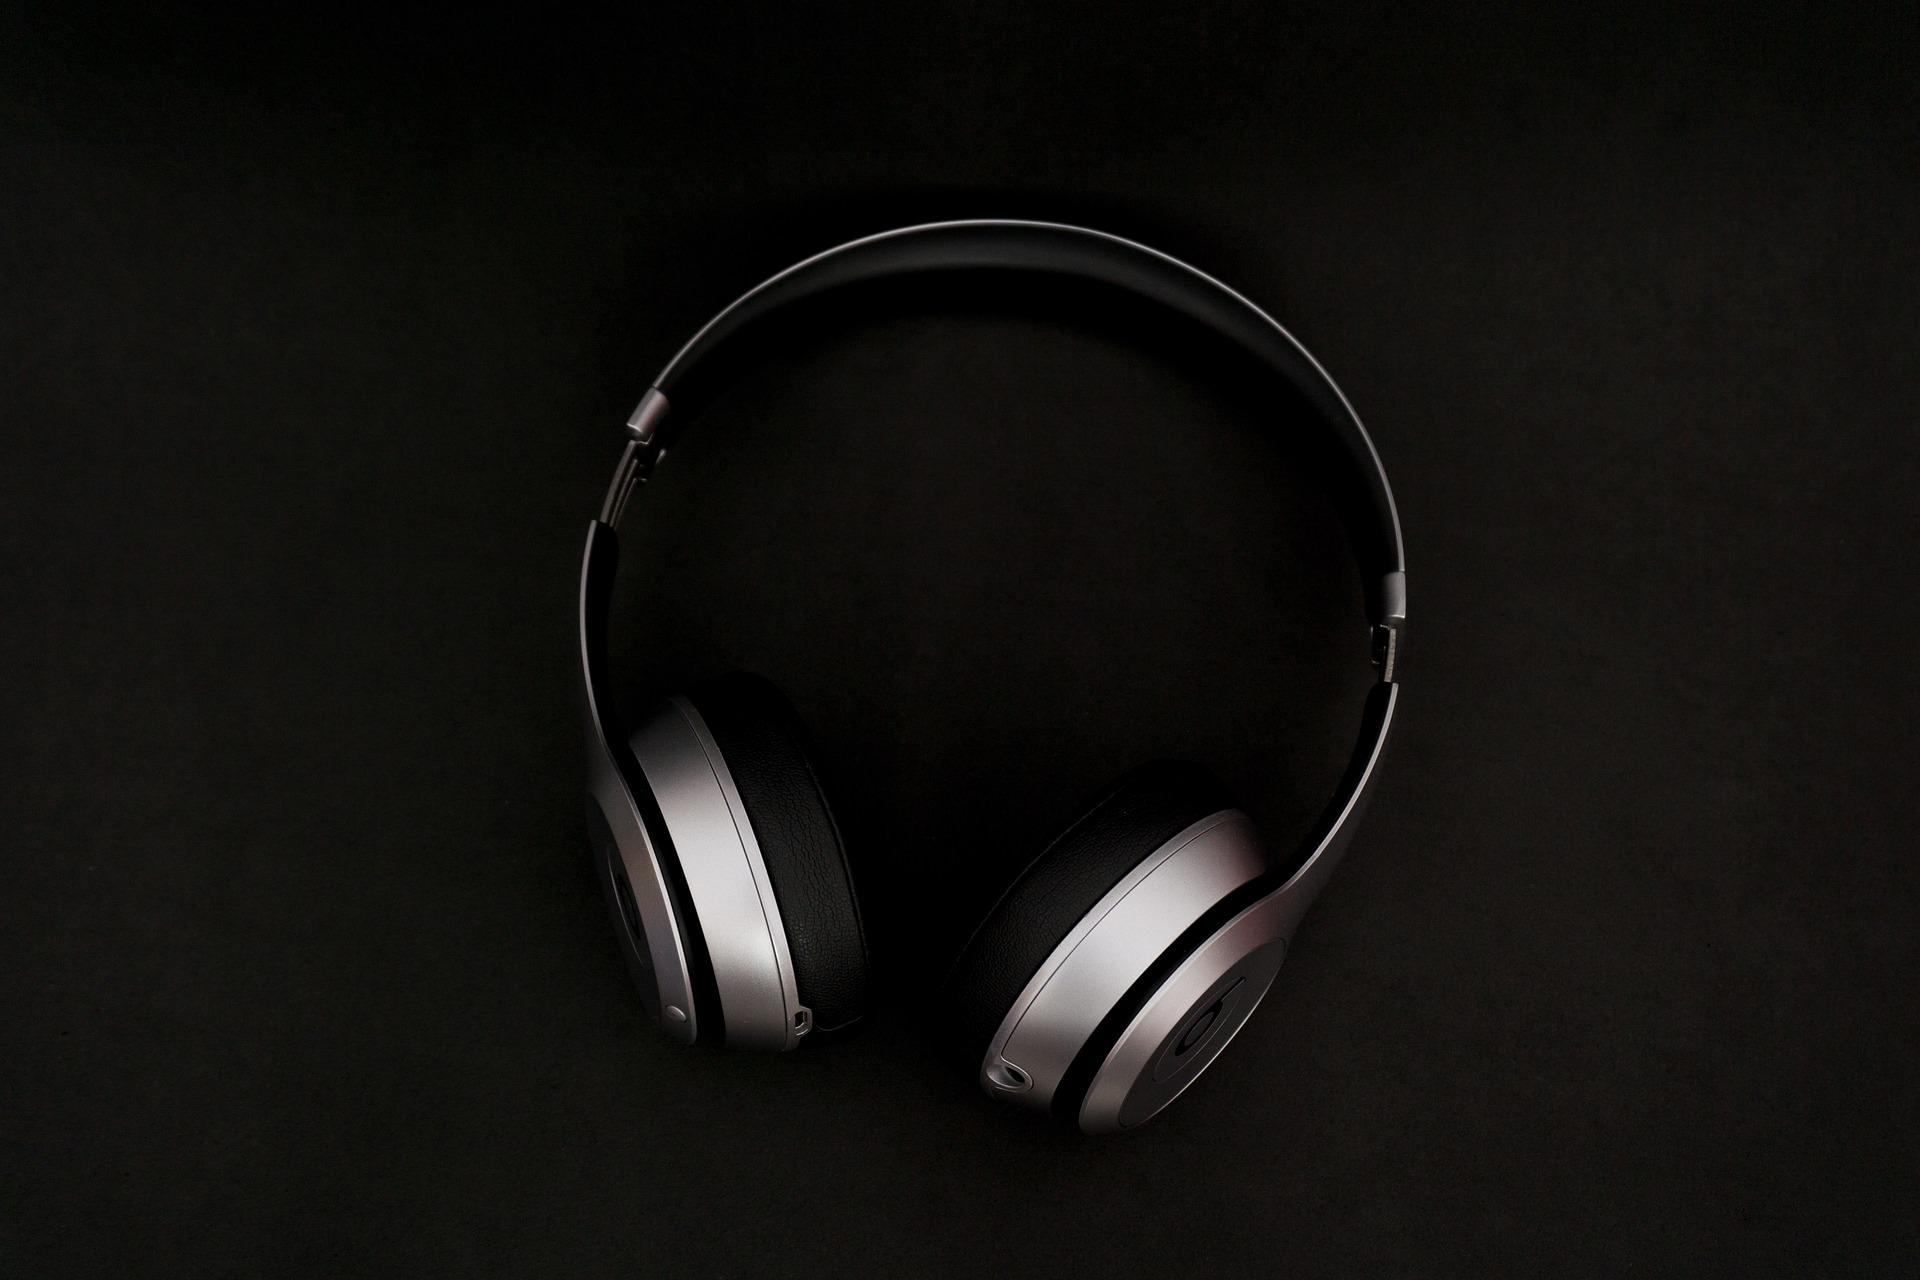 headphones-2588056_1920